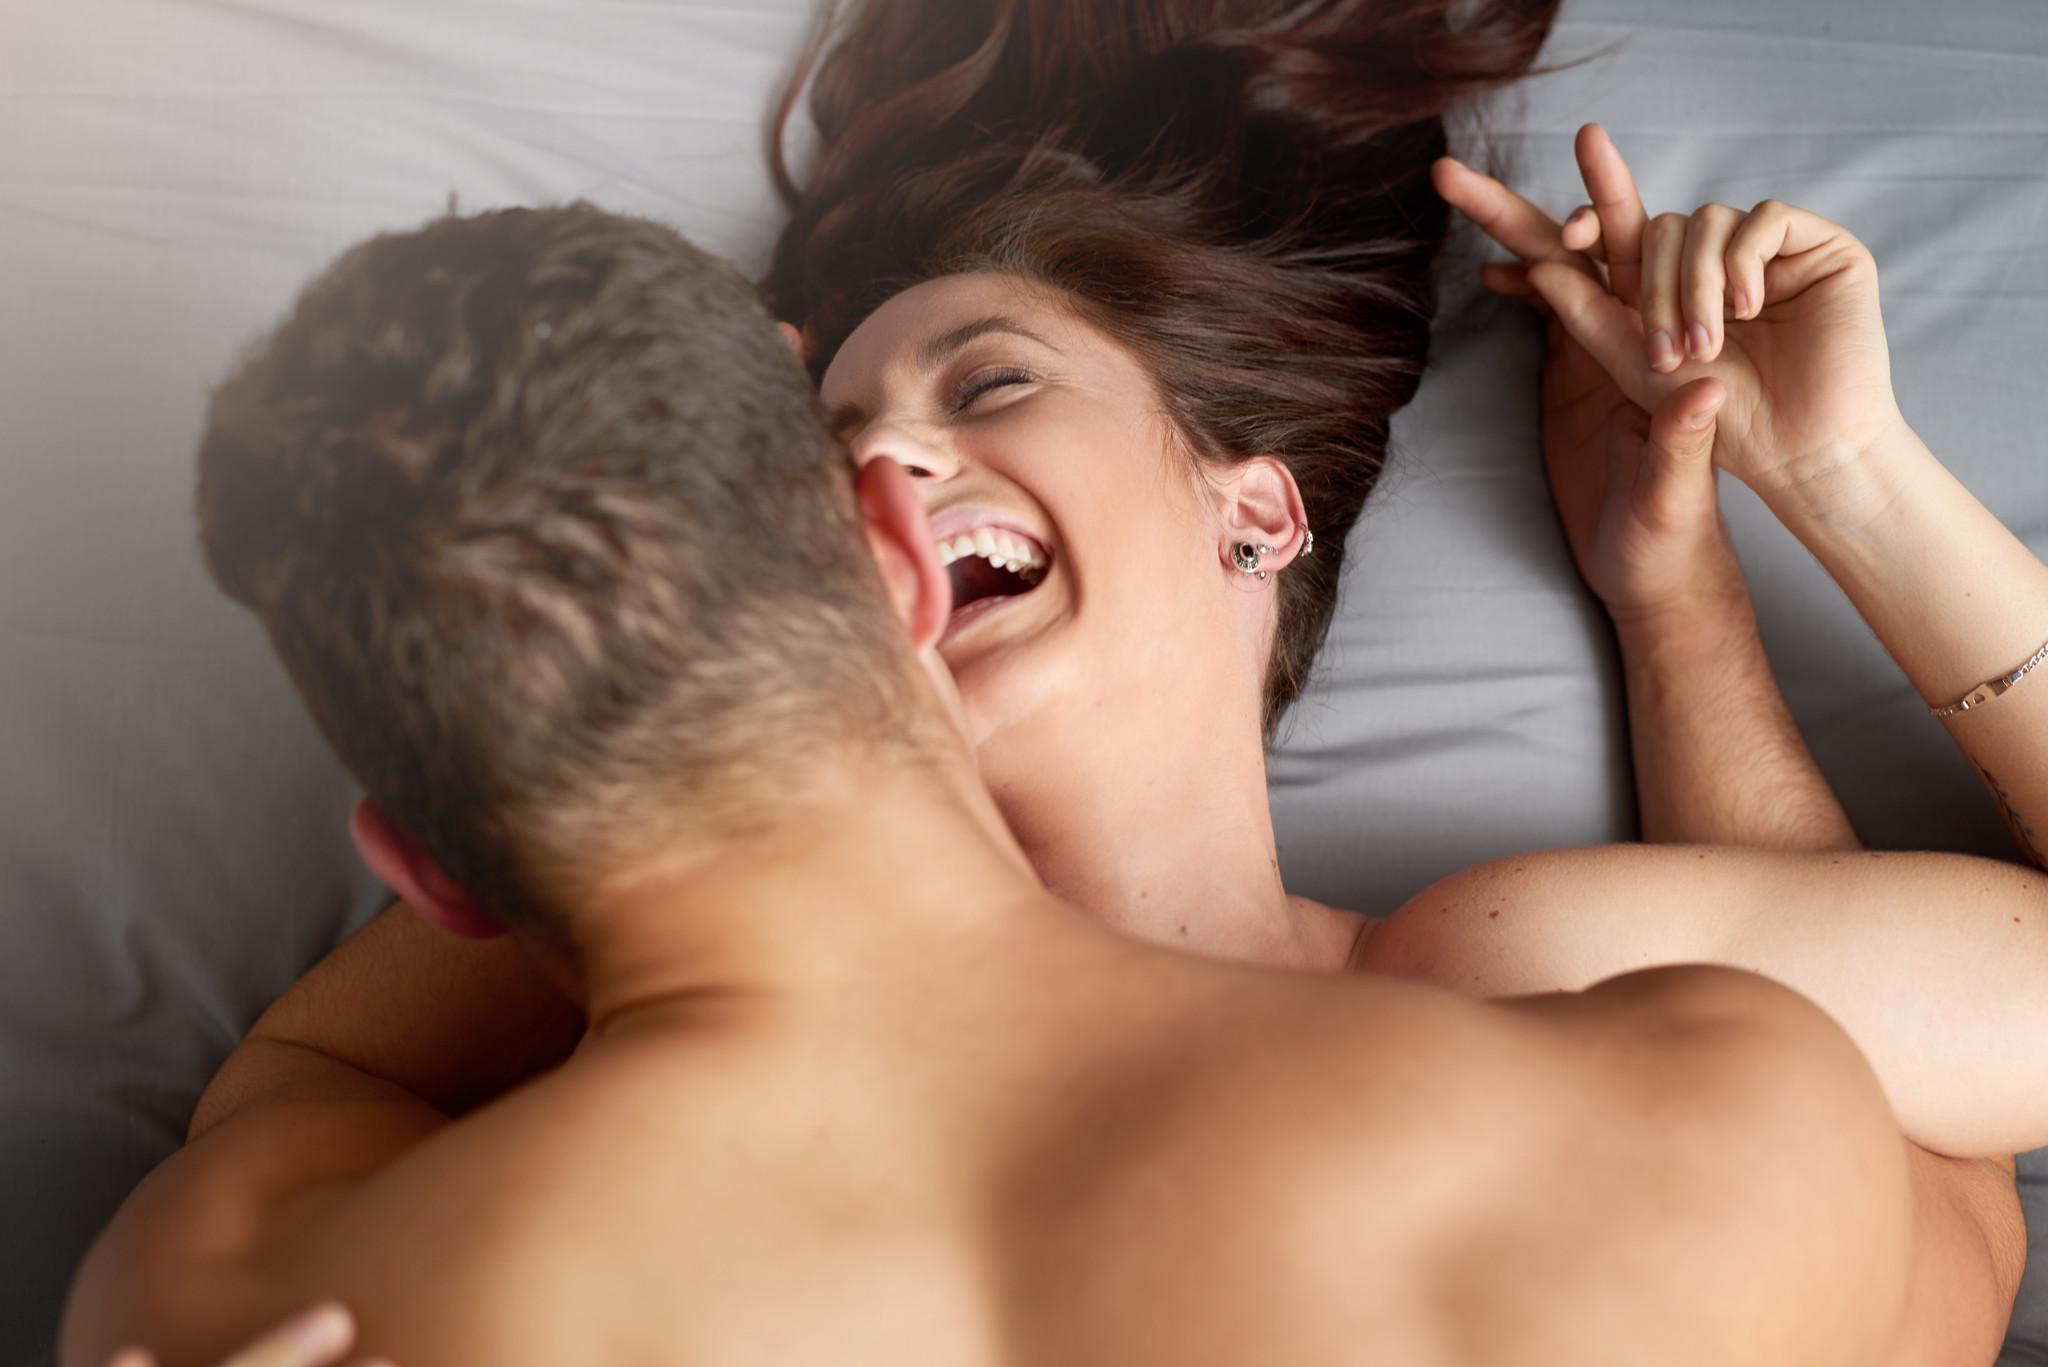 casal feliz sexo relação.jpg